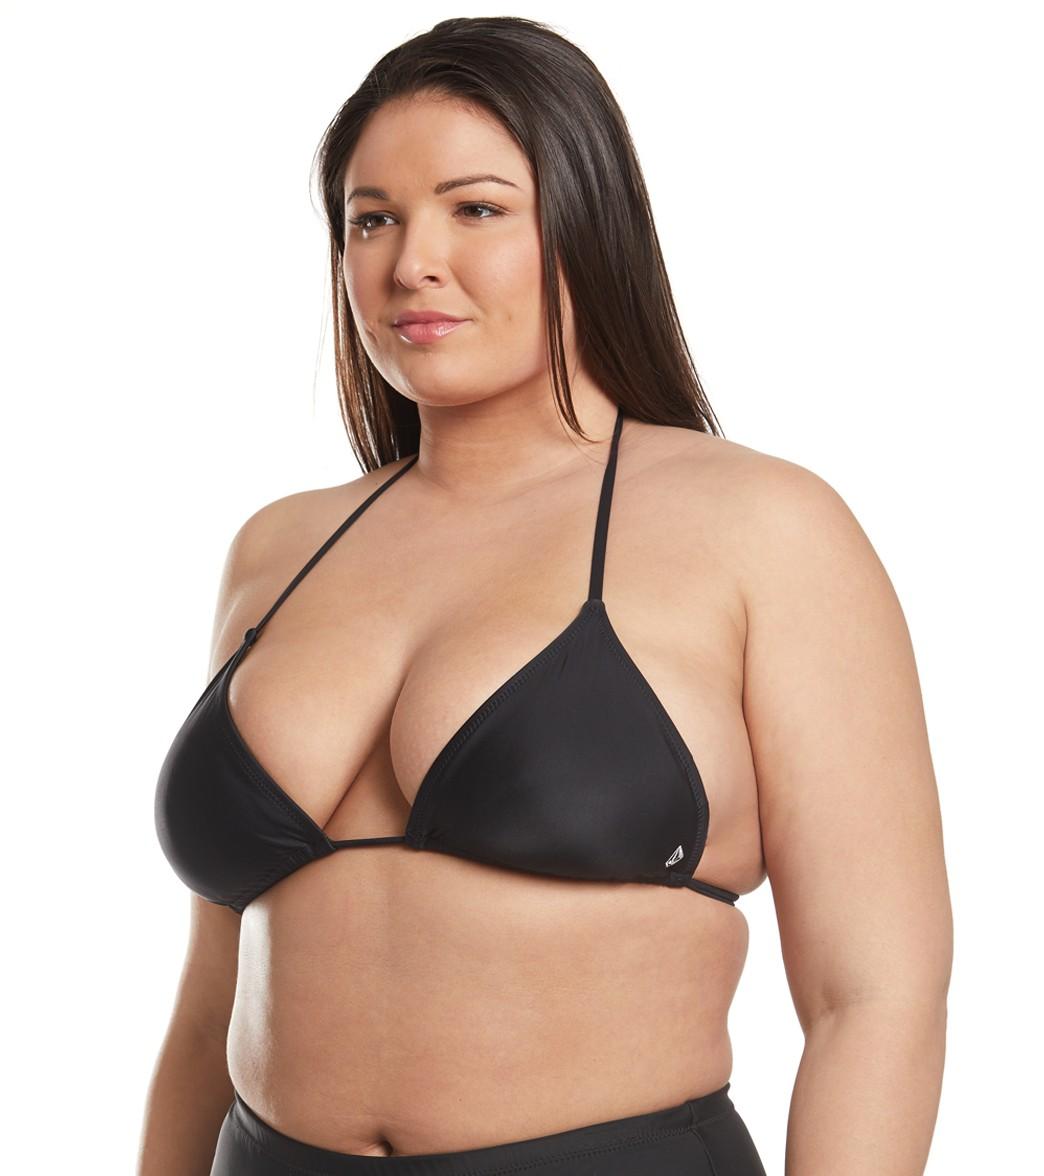 afc0a2b2fa0 Volcom Plus Size Simply Solid Triangle Bikini Top at SwimOutlet.com